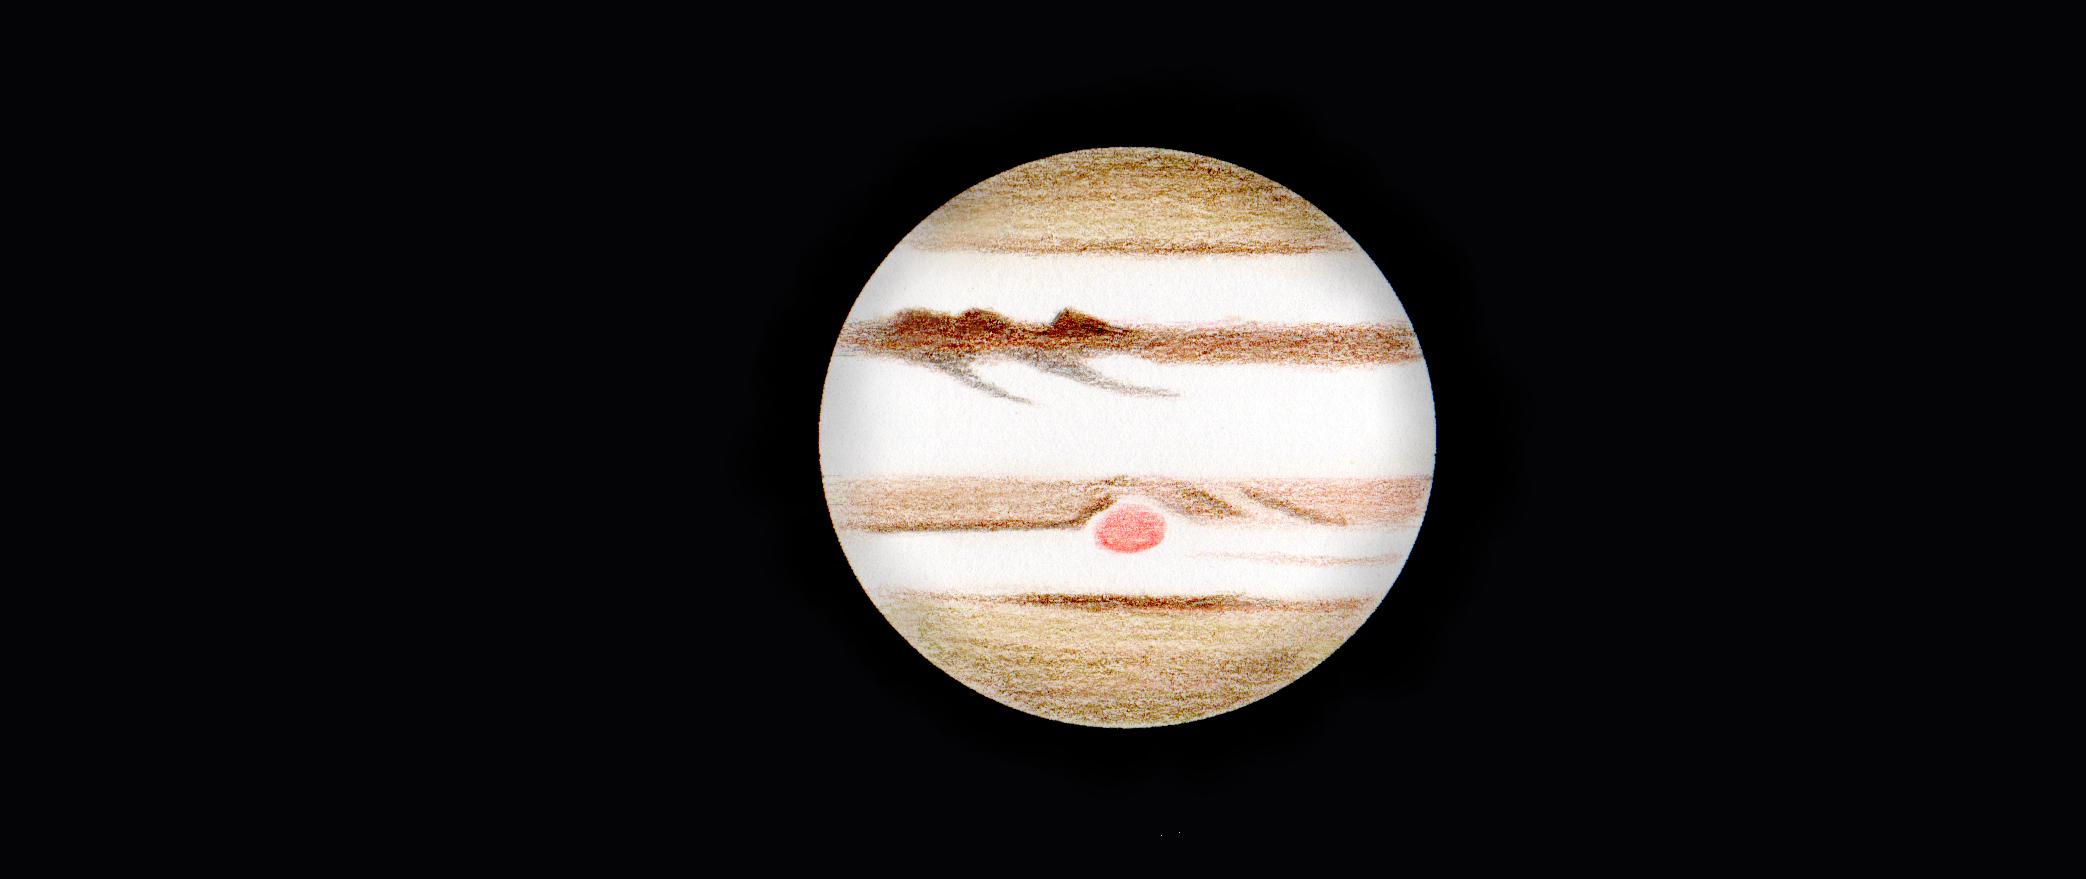 Jupiter opposition 2018